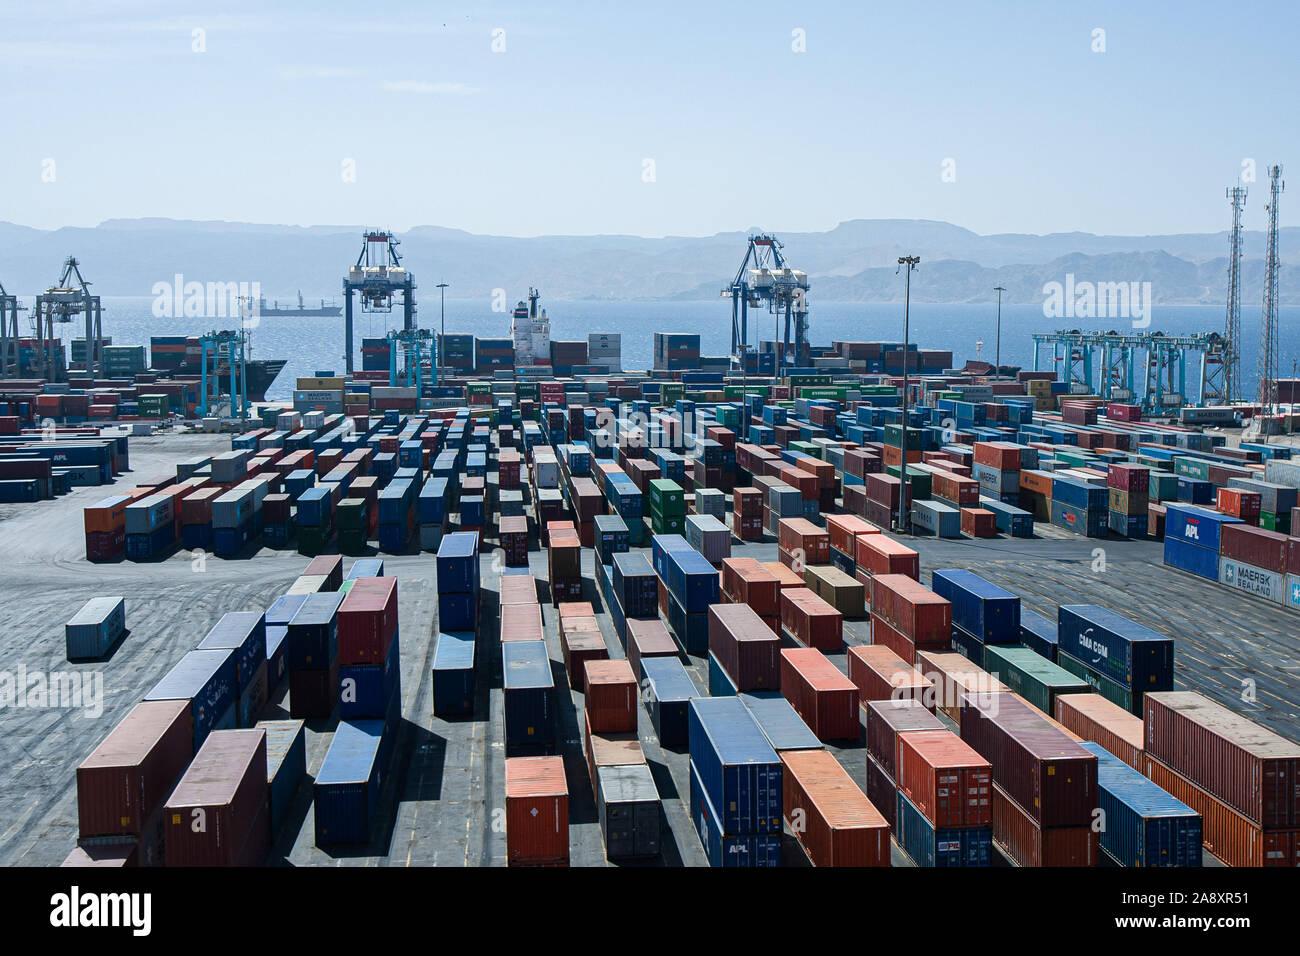 Aqaba, Jordan, April 27, 2009: Containers at the port of Aqaba in Jordan. Stock Photo